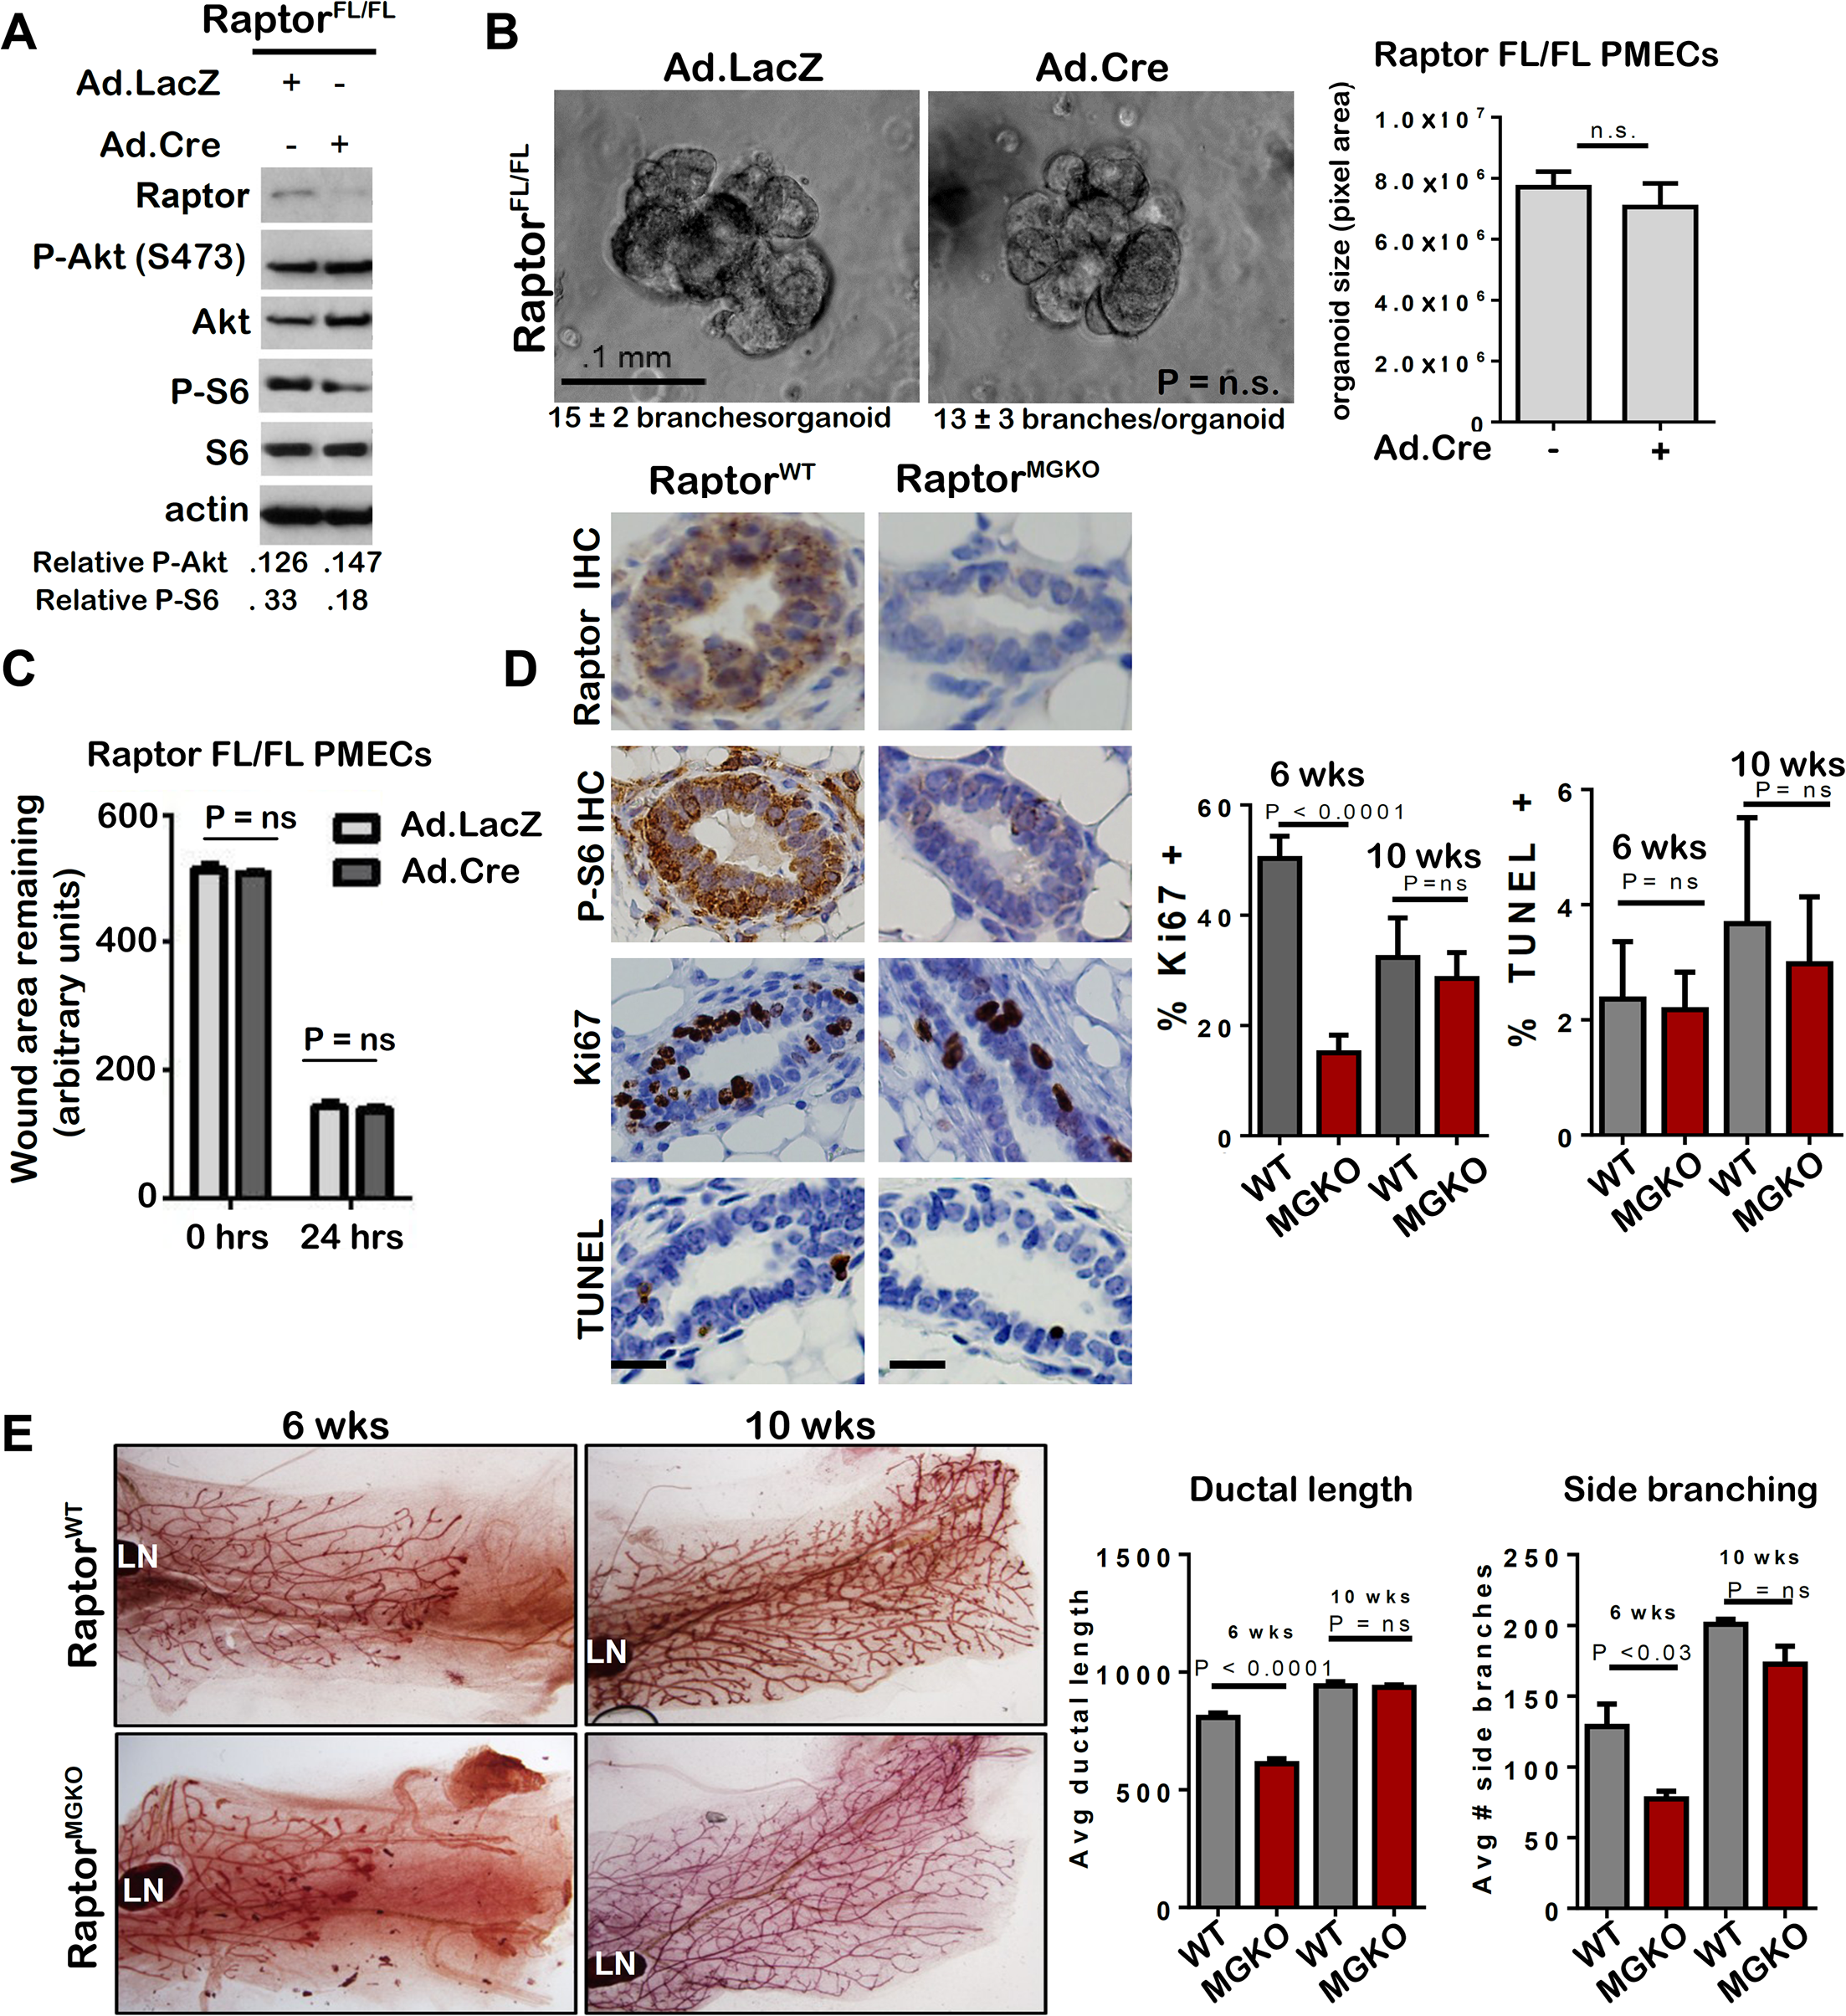 Unlike mTORC2, mTORC1 is dispensable for MEC survival and branching morphogenesis.